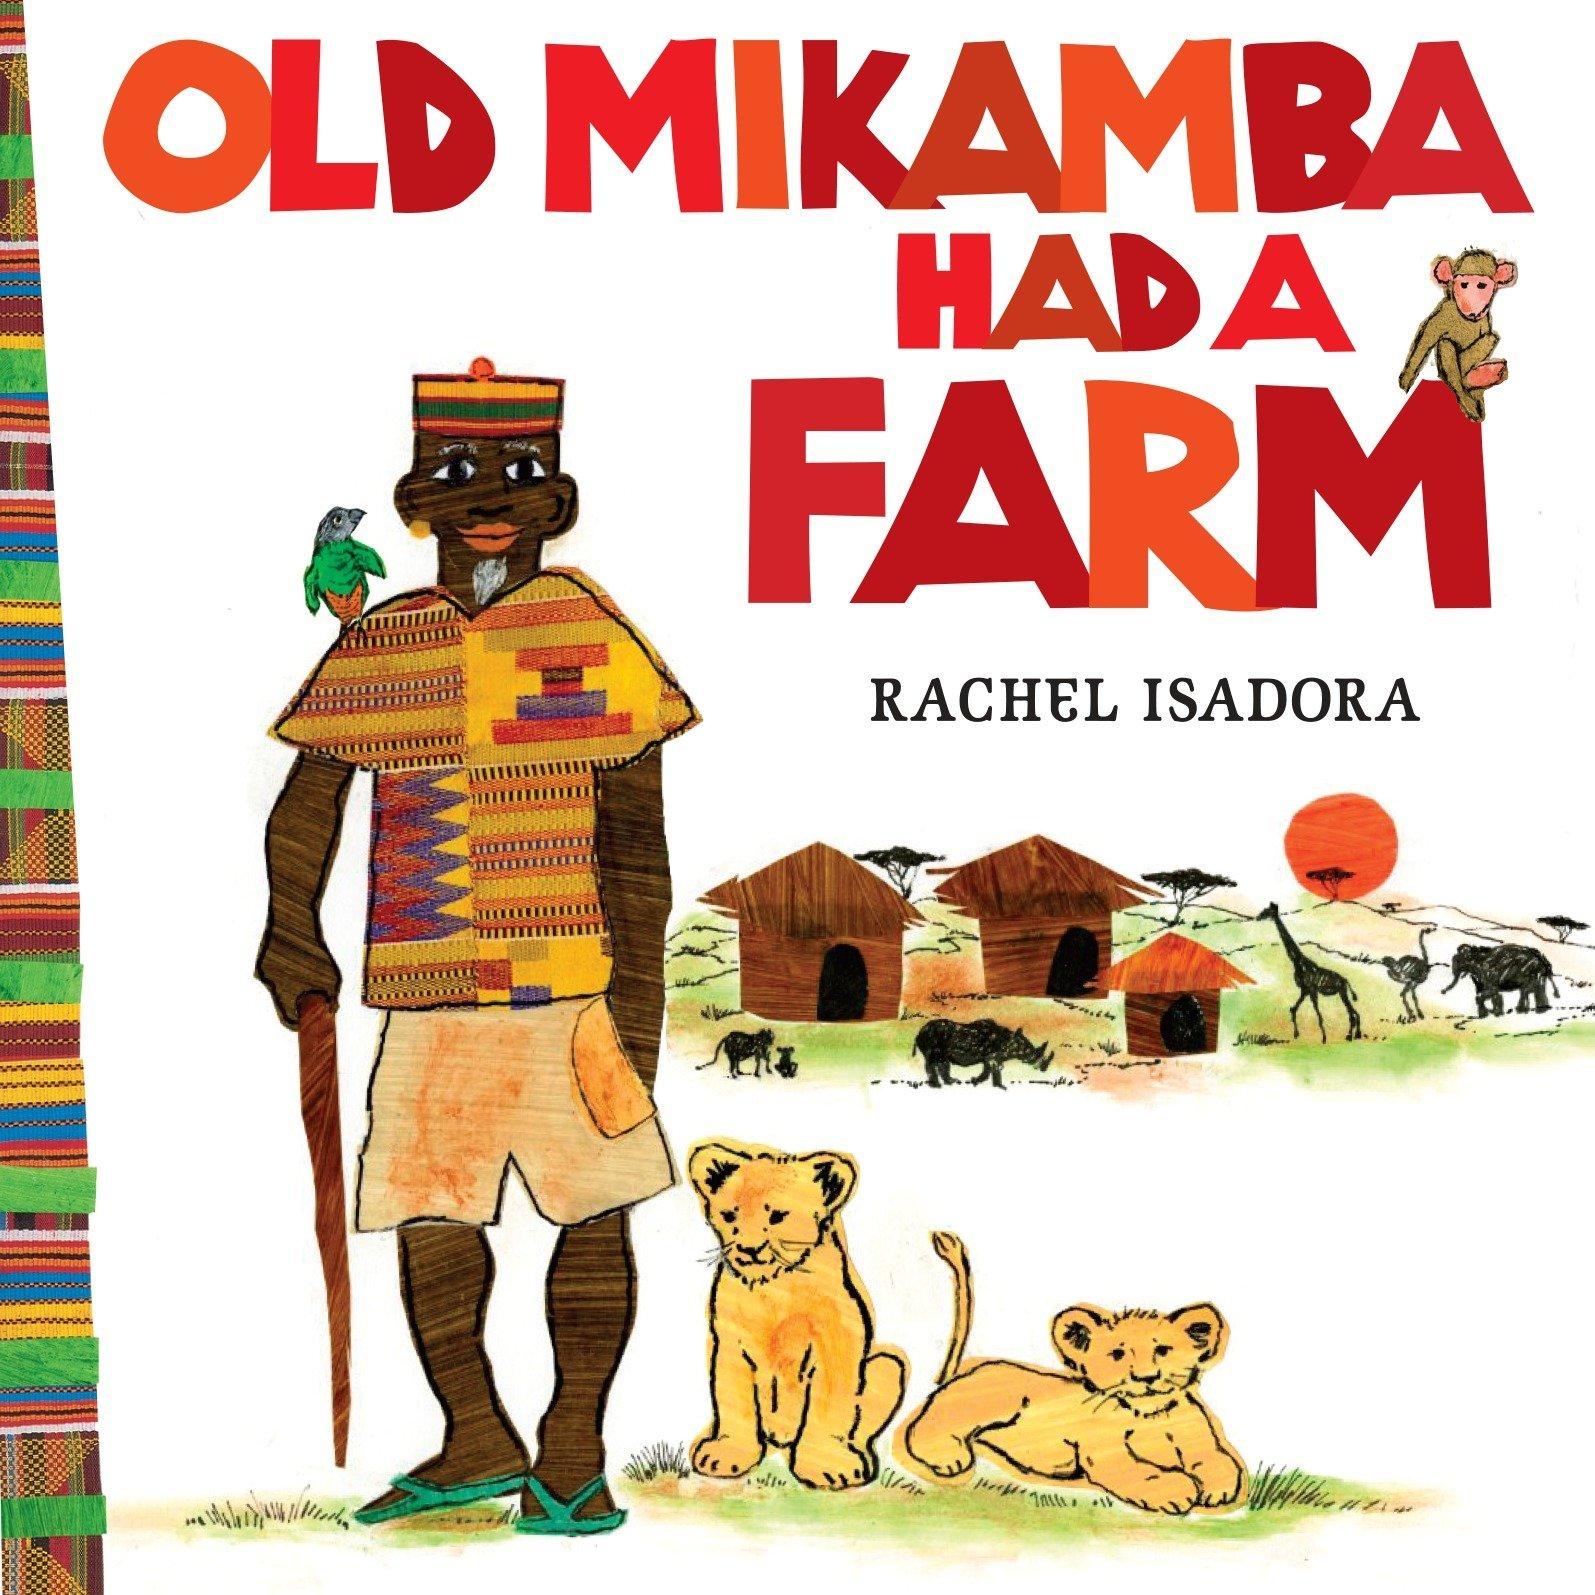 Old Mikamba Had a Farm